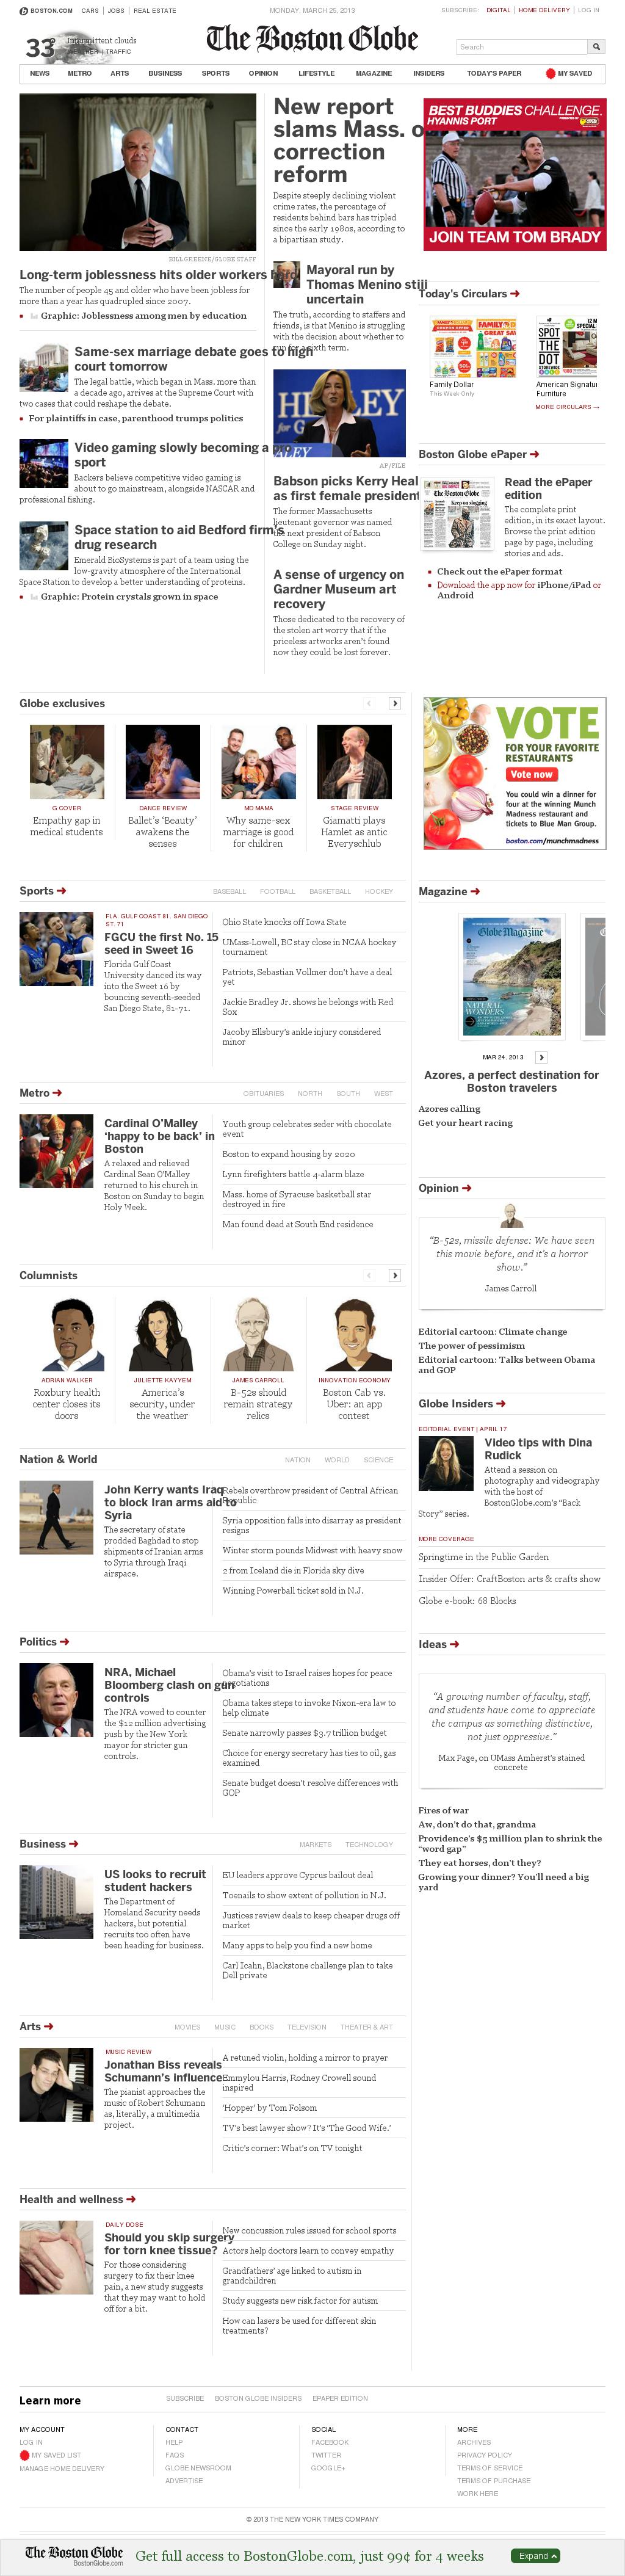 The Boston Globe at Monday March 25, 2013, 11:04 a.m. UTC